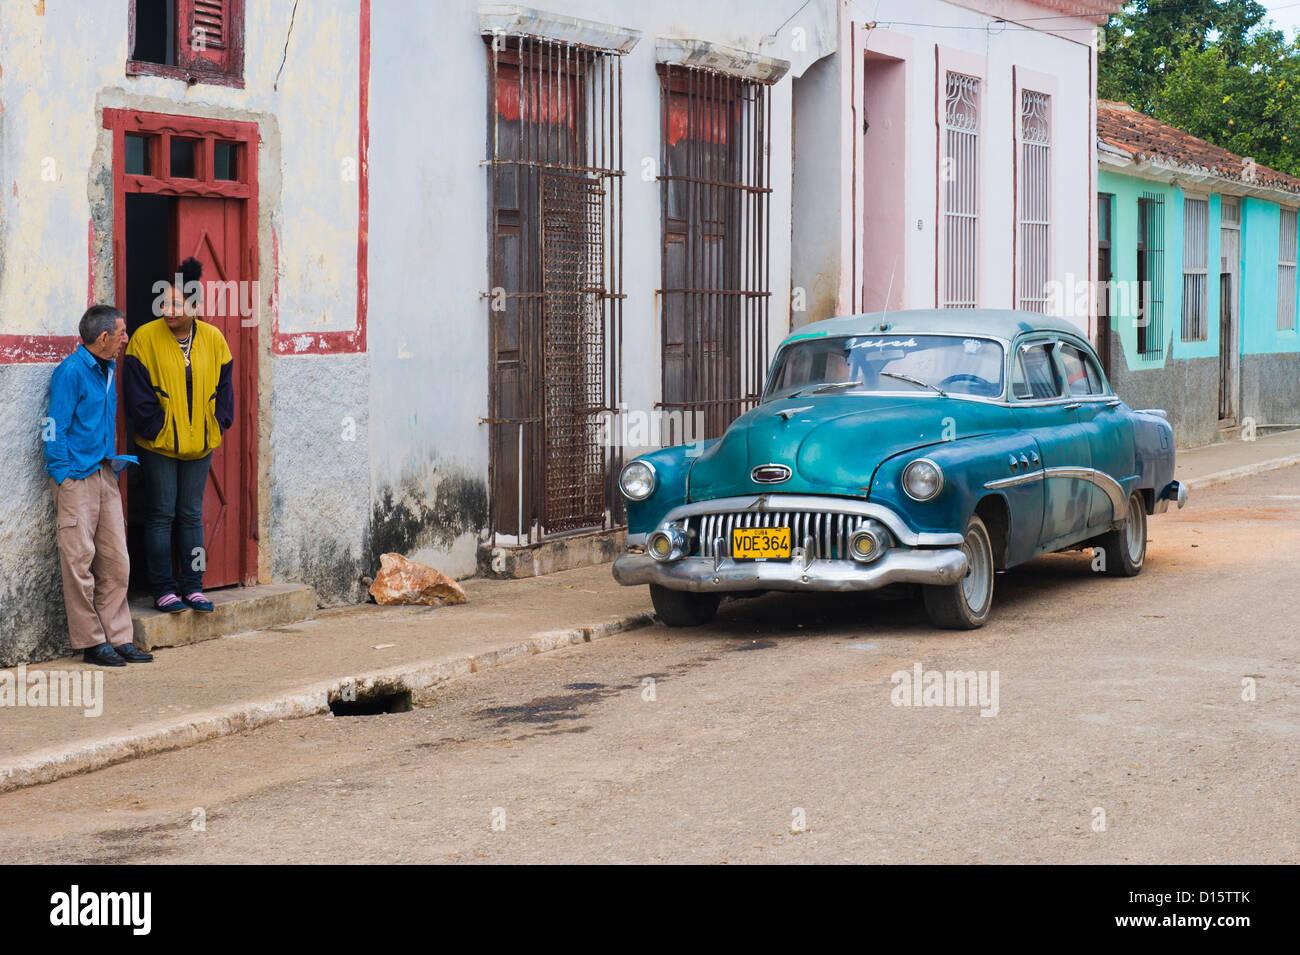 Oldtimer car, Santa Clara Province, Cuba - Stock Image